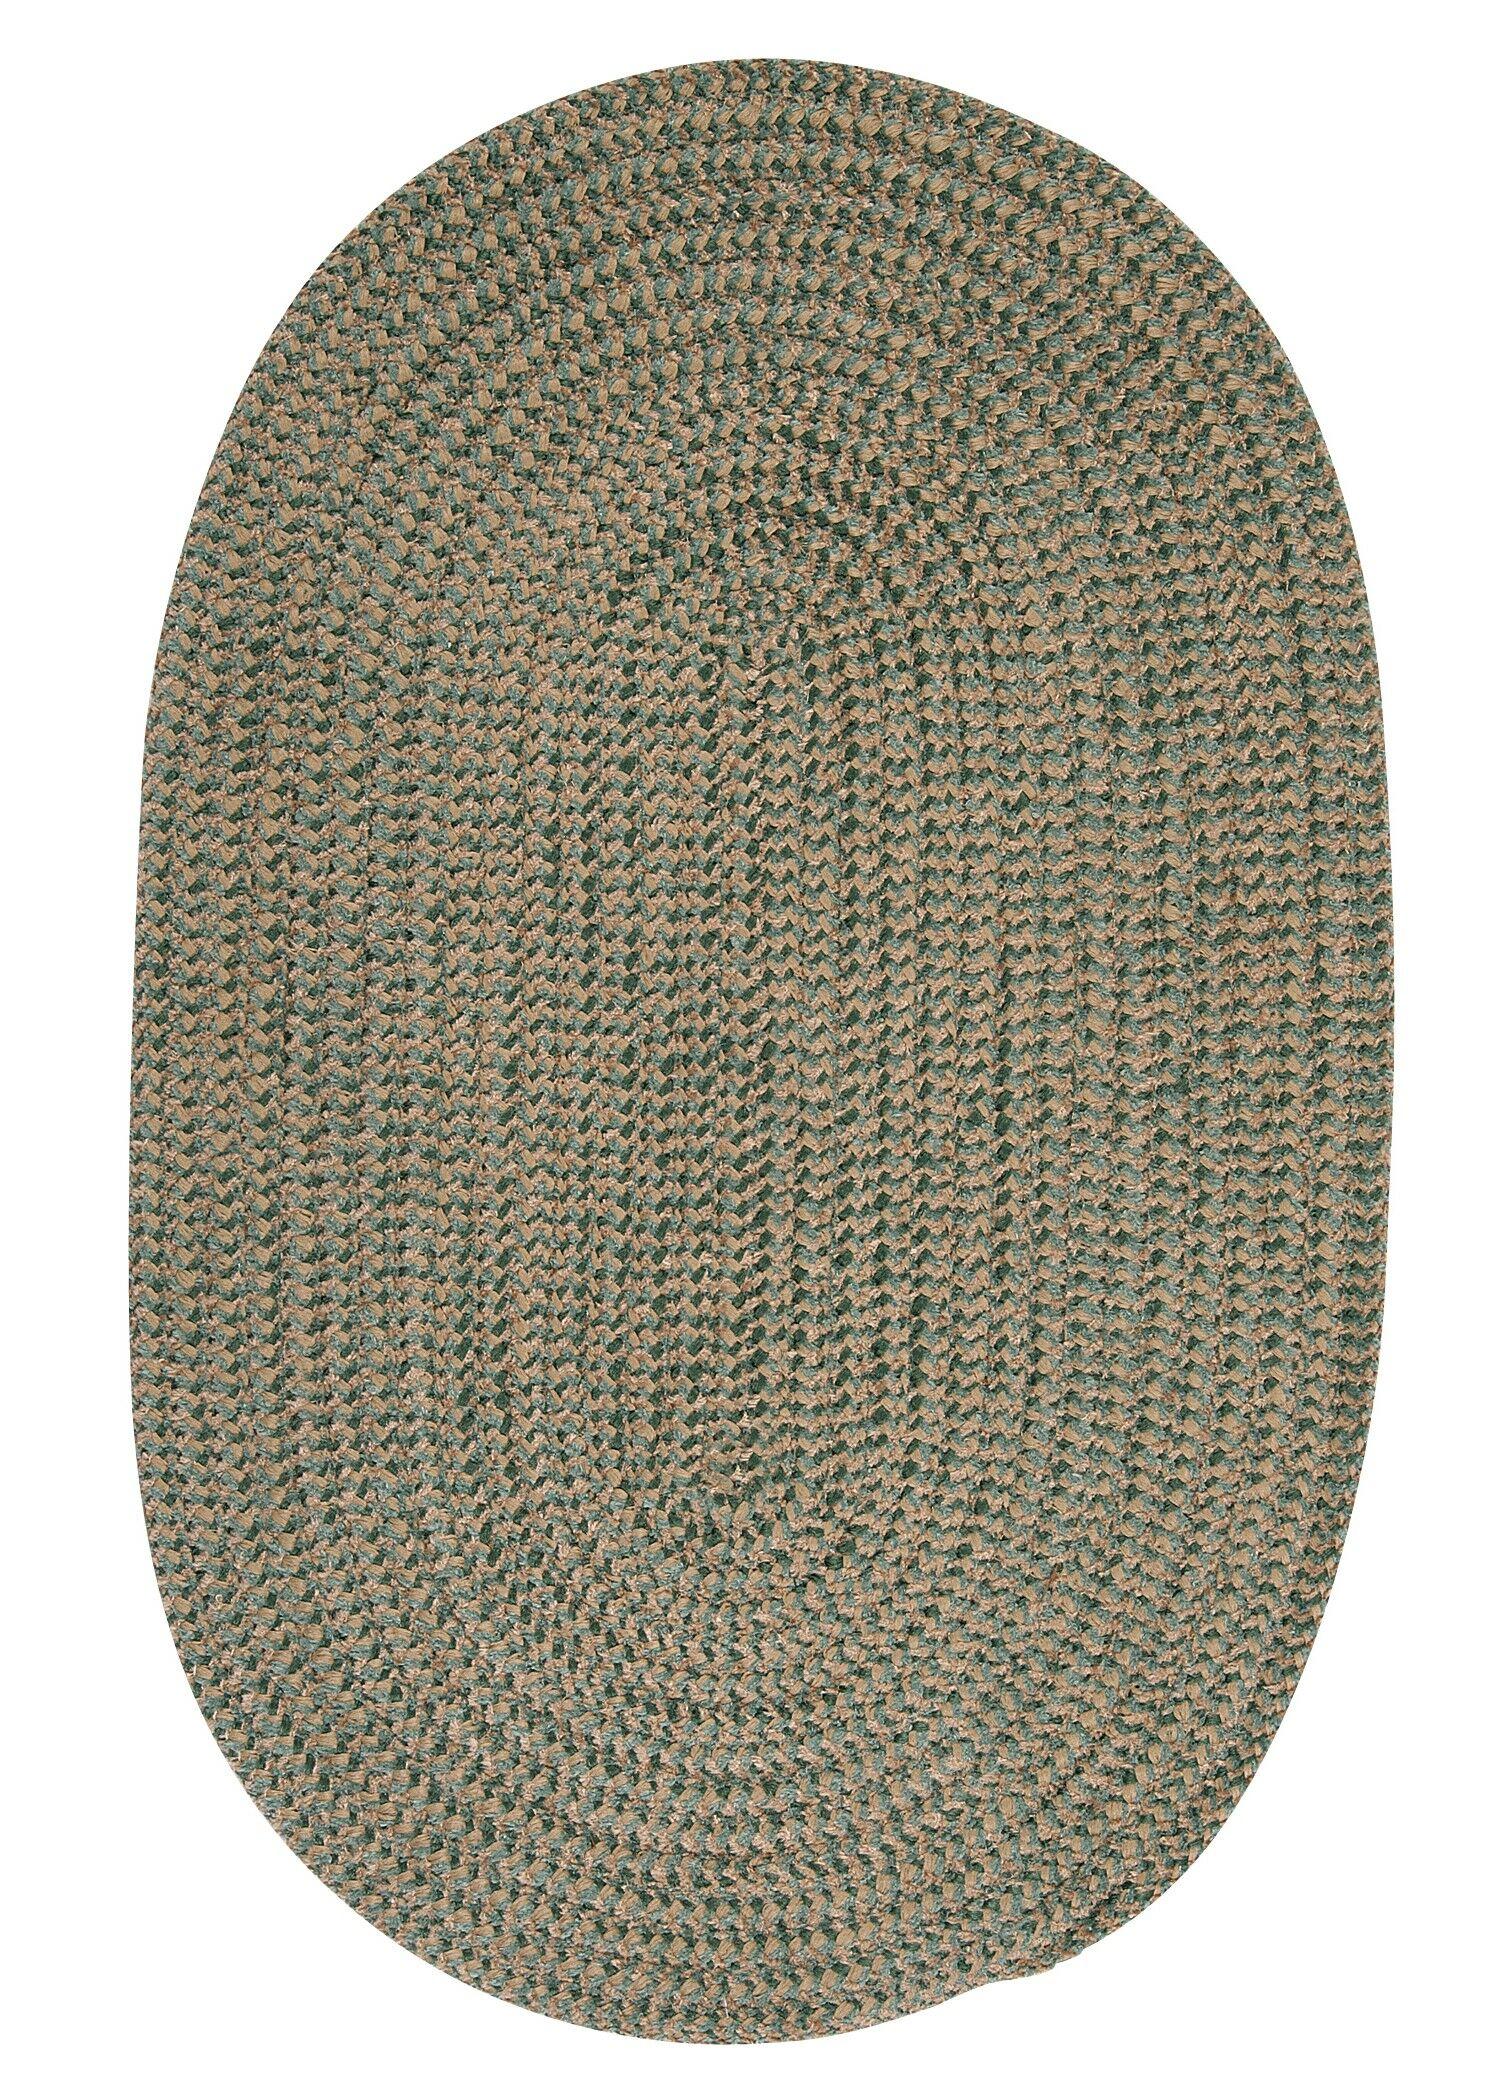 Hale Myrtle Green Check Indoor/Outdoor Area Rug Rug Size: Oval 12' x 15'